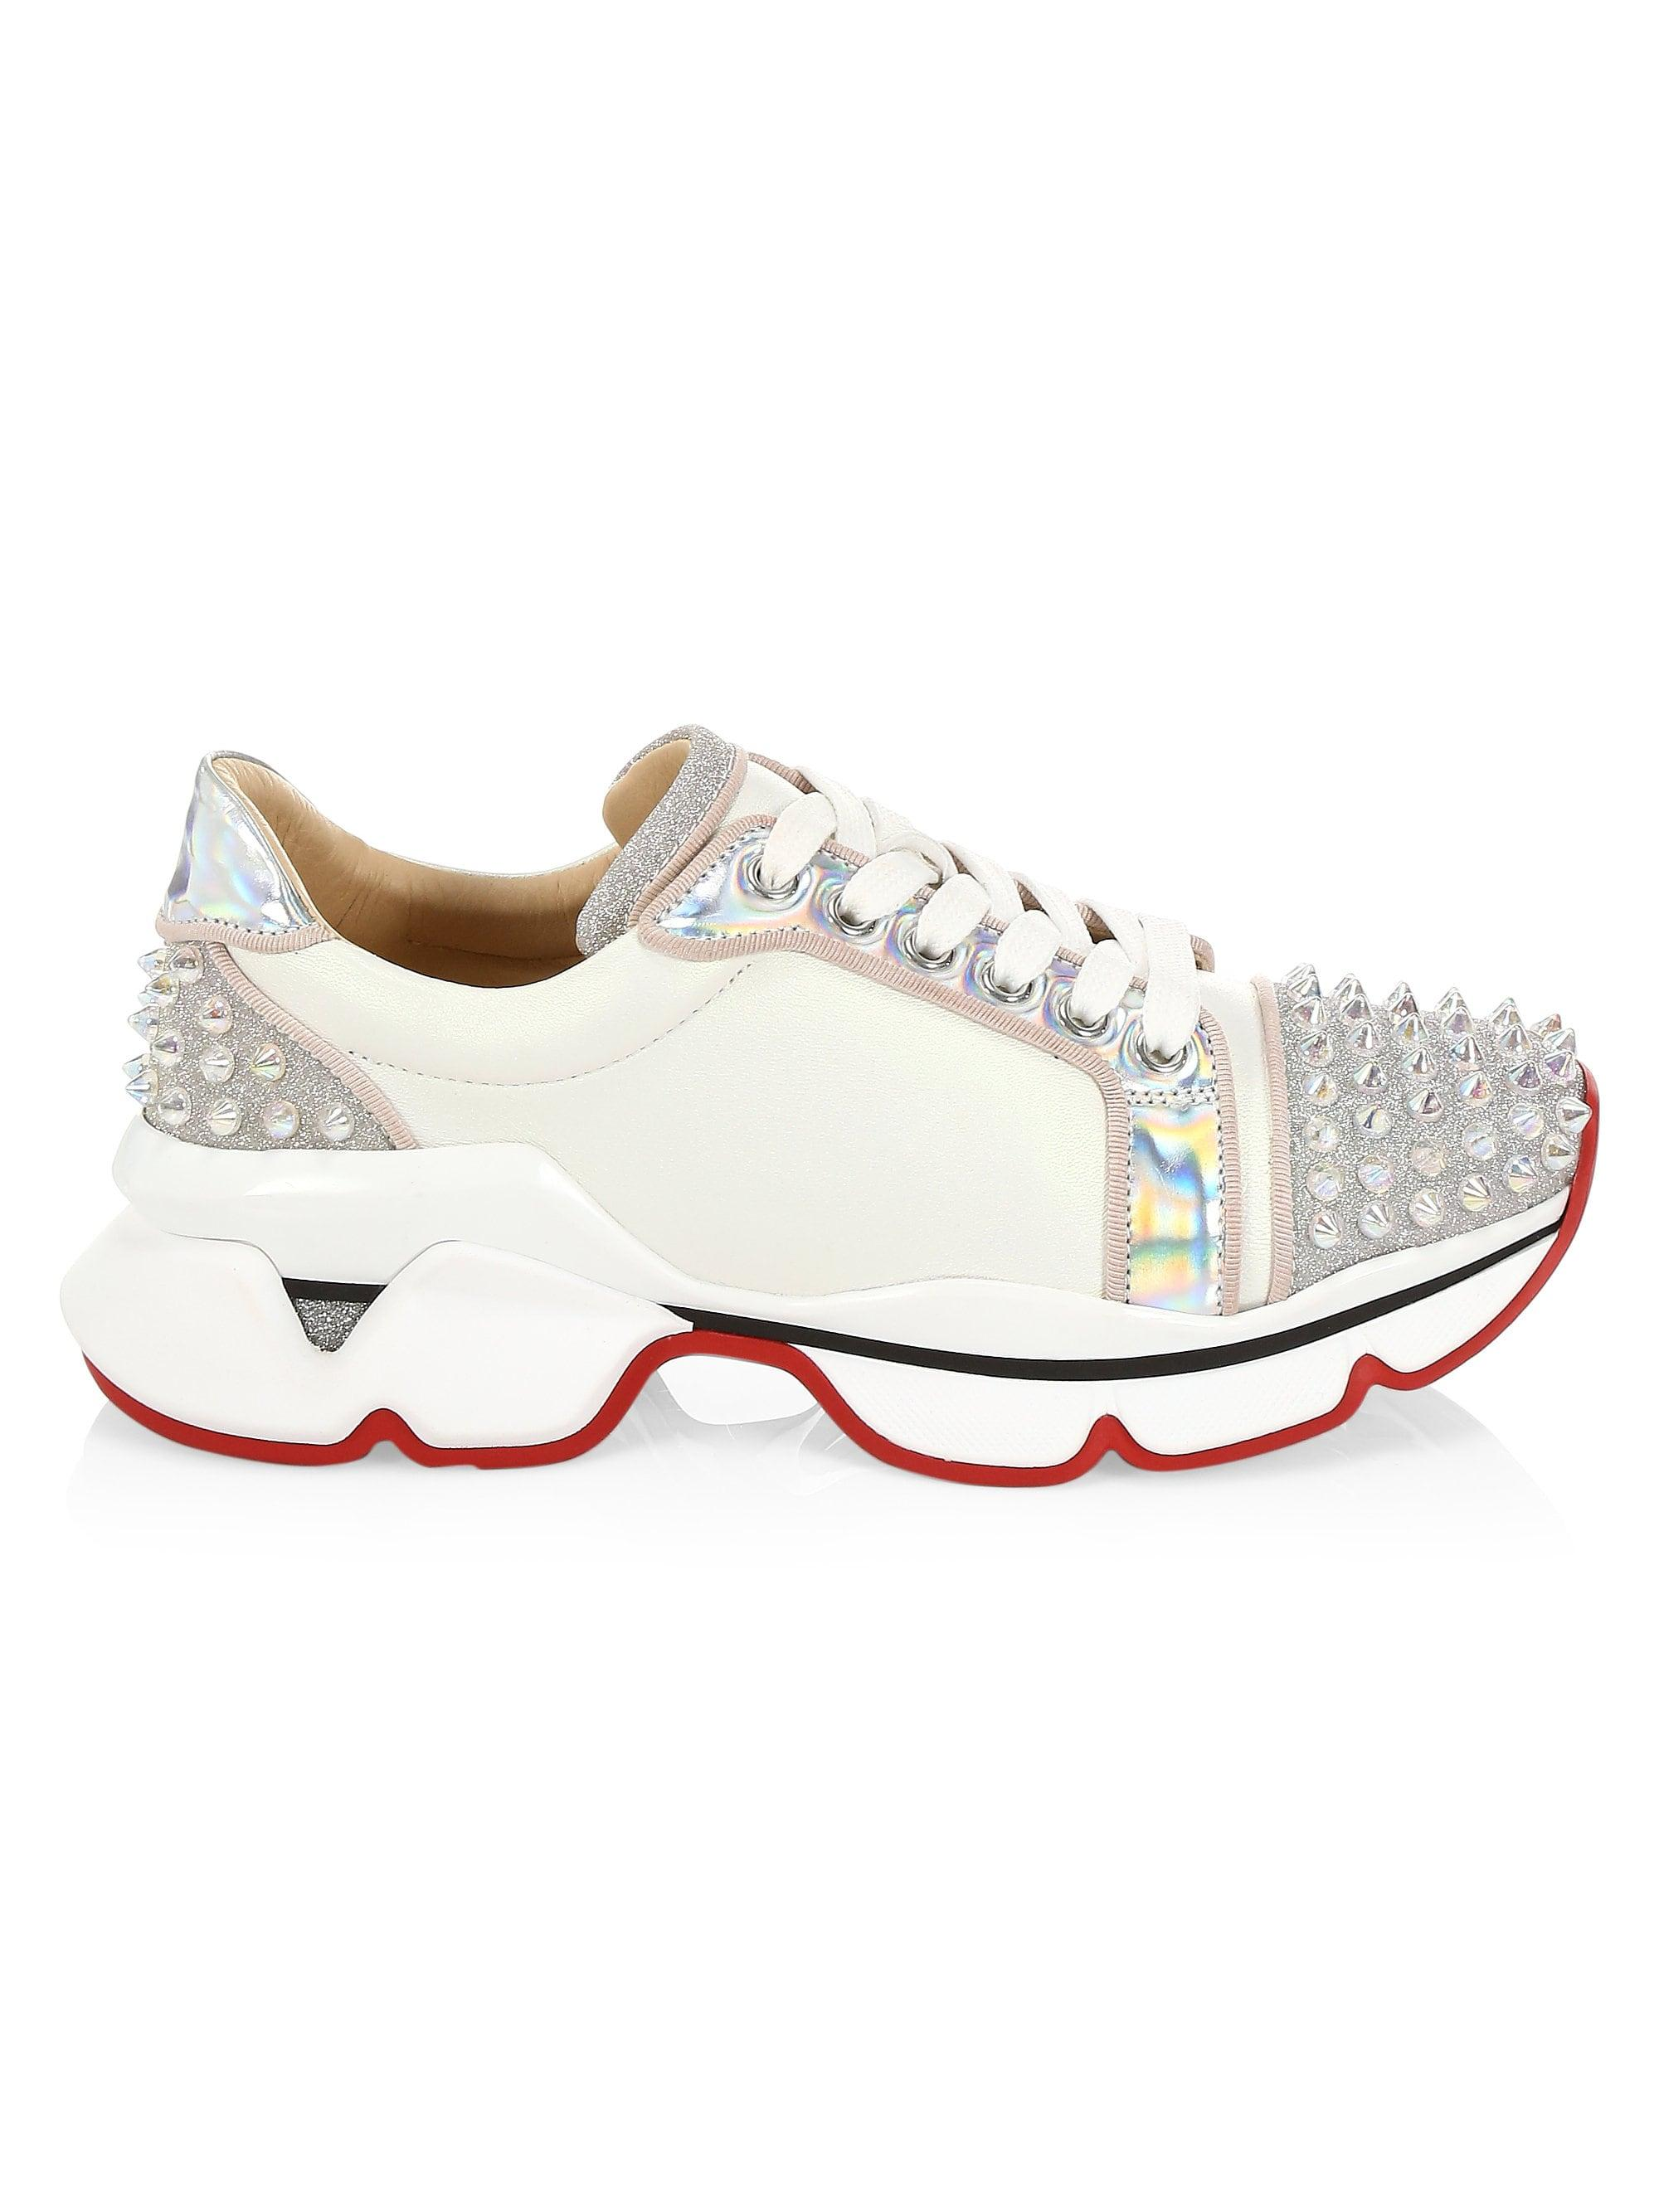 3f5eee8102b Women's White Orlato Spike Sneakers